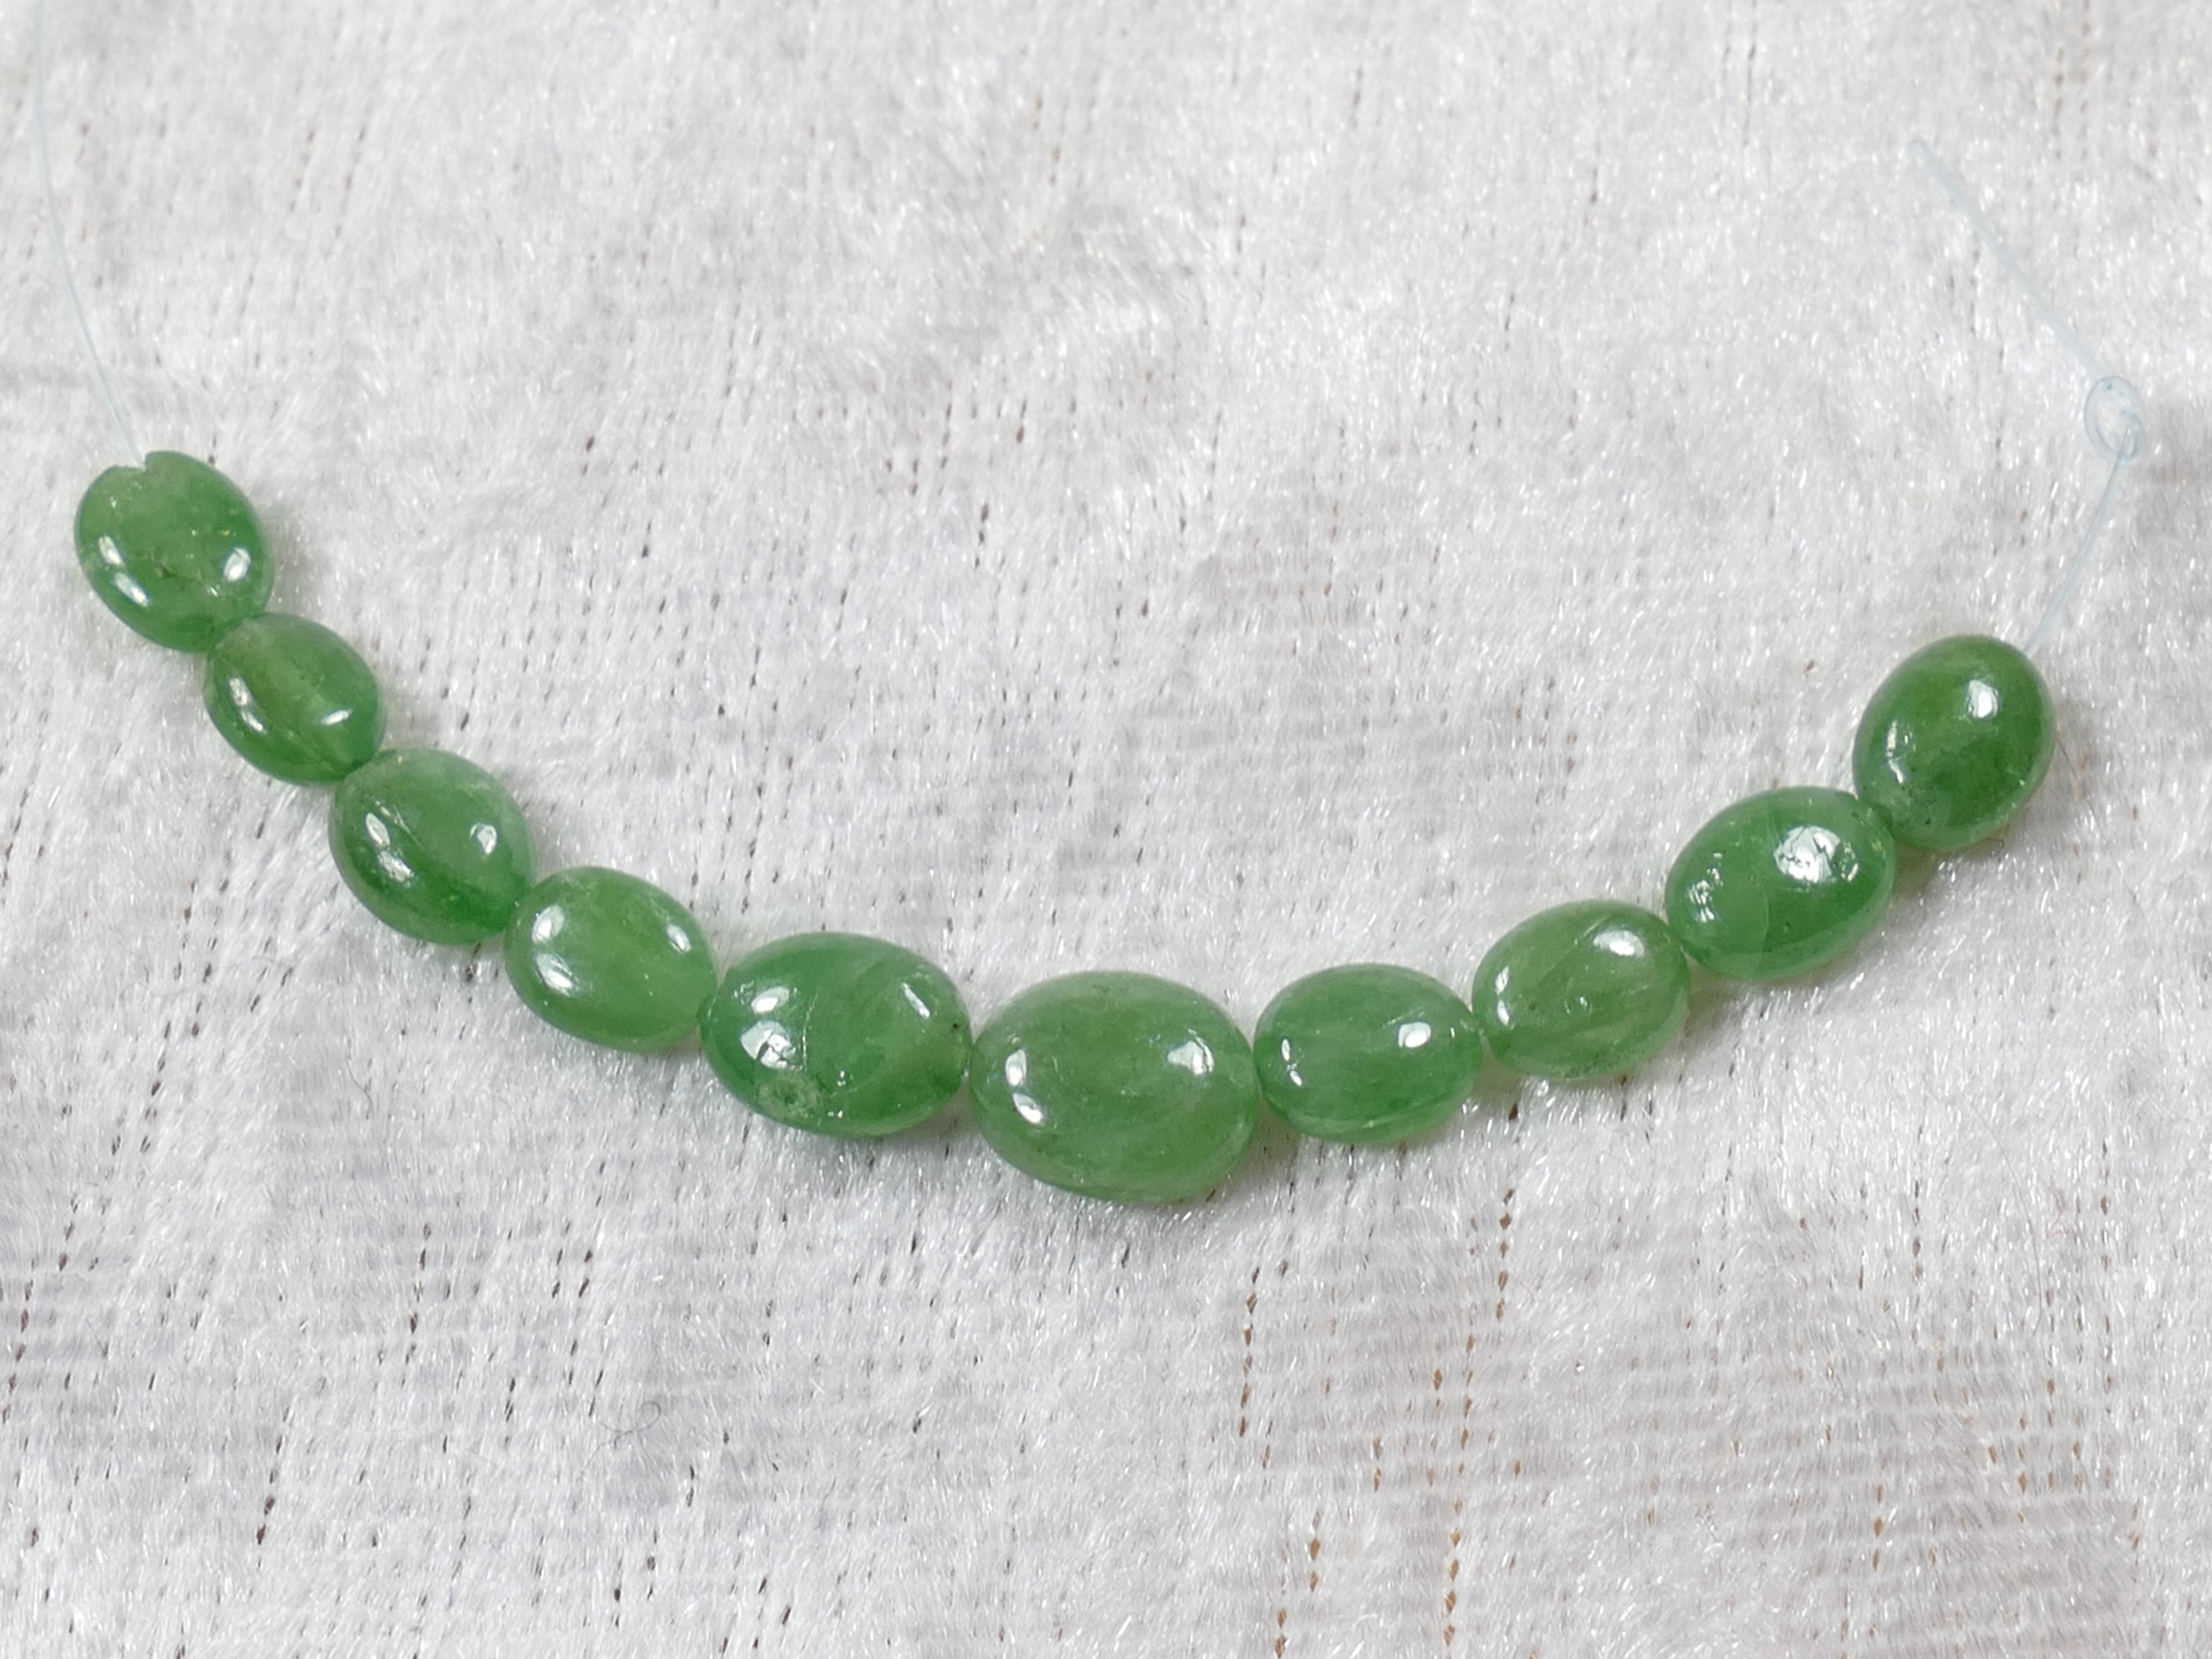 4-5.7mm 10 Perles de Grenat vert Tsavorite naturel du Kenya en ovale lisse (#PM841)